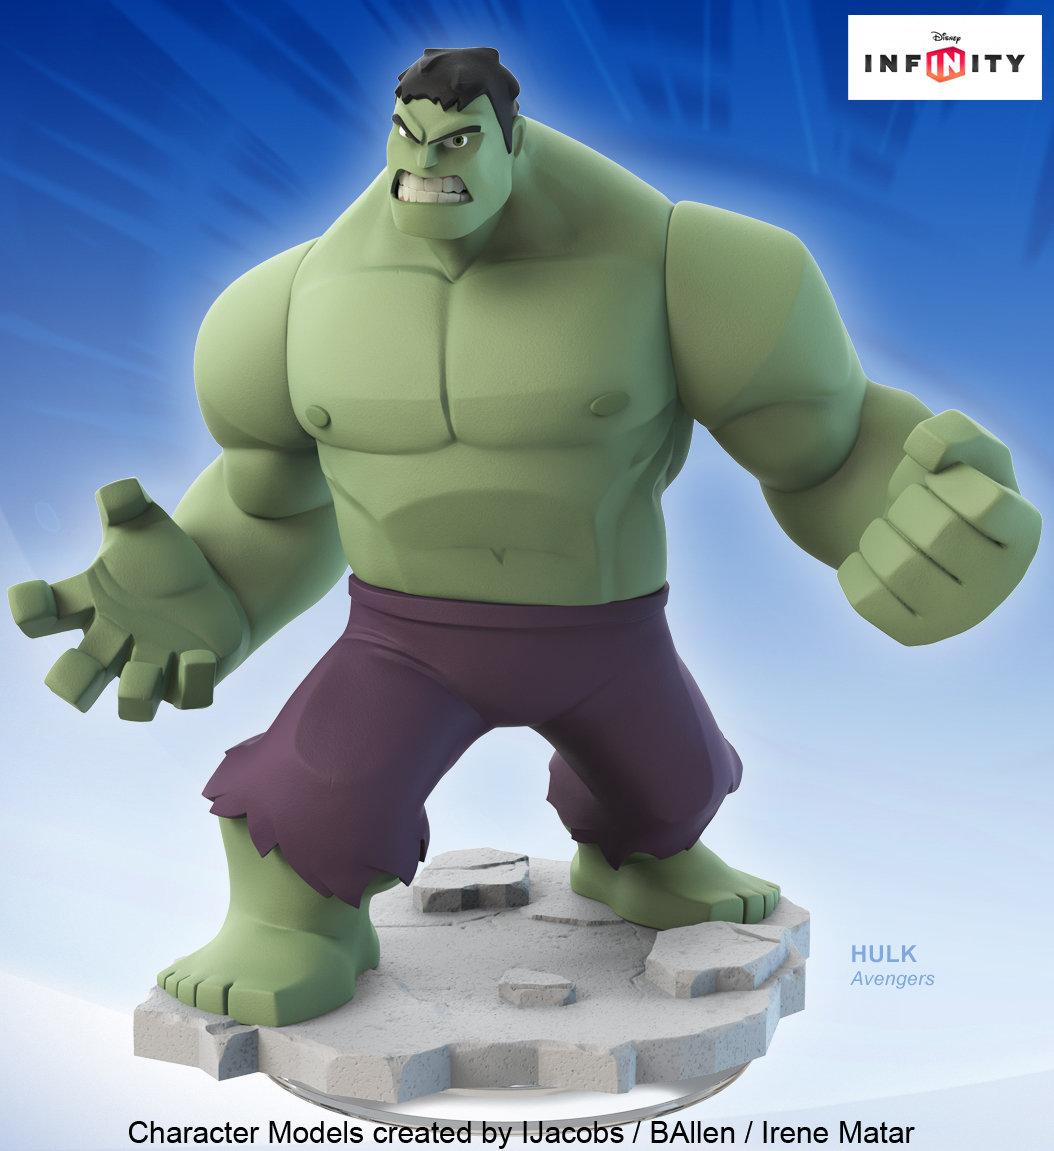 Hulk model by IJacobs / BAllen / Irene Matar